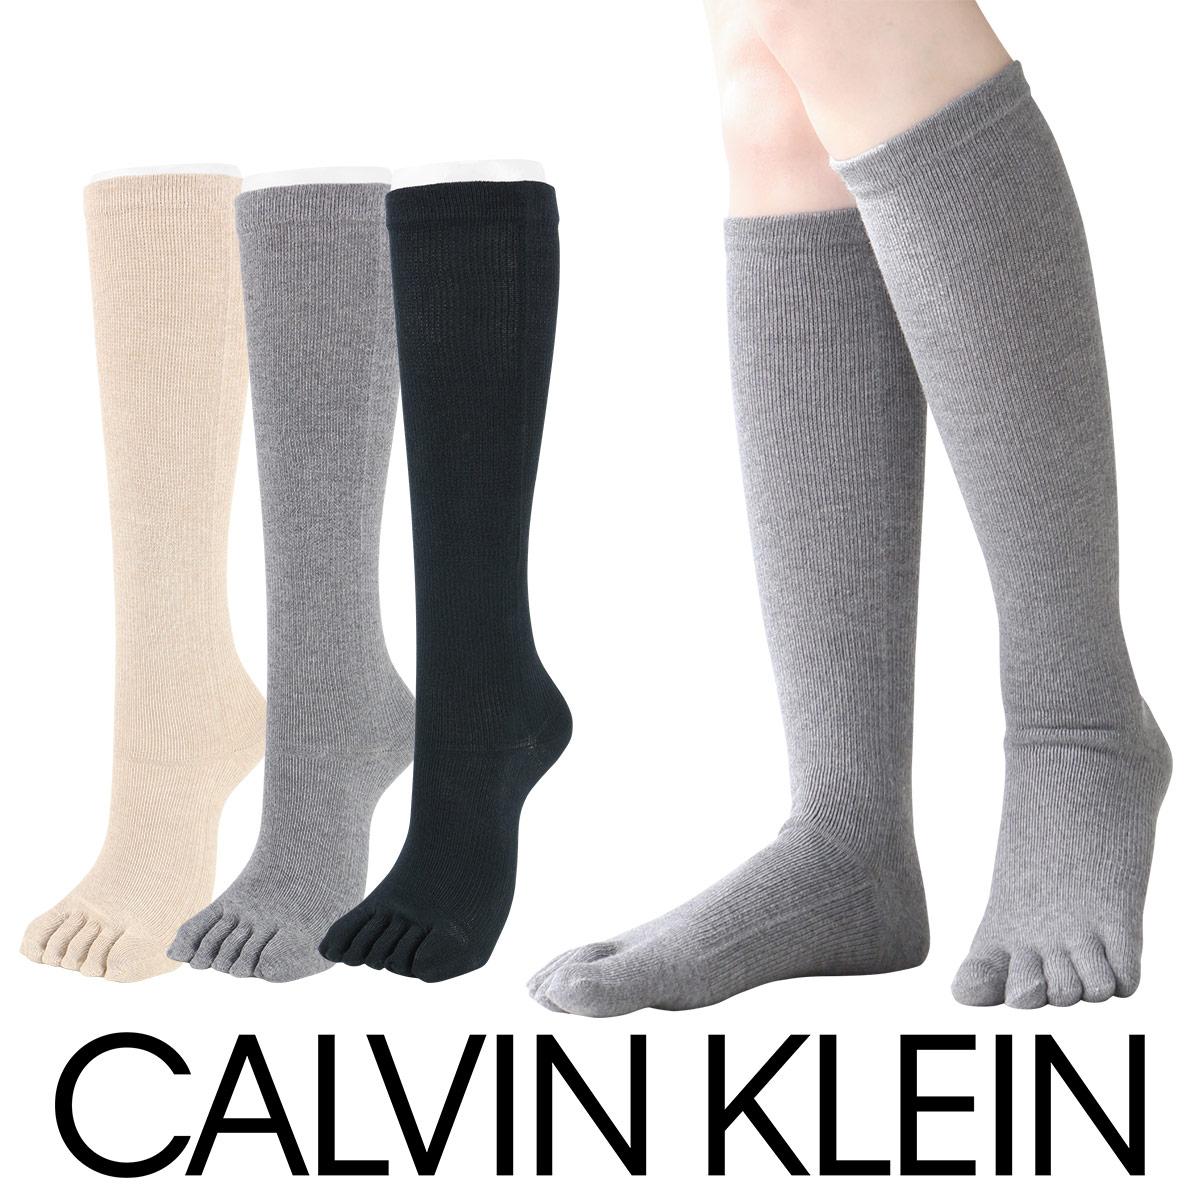 Calvin Klein ( カルバンクライン ) 綿混 着圧 (20hPa) ハイソックス丈 5本指 レディス ソックス つま先かかとに消臭糸使用 引き締め効果 サポートフィット 女性 レディス 靴下 3265-307 【ゆうパケット・4点まで】